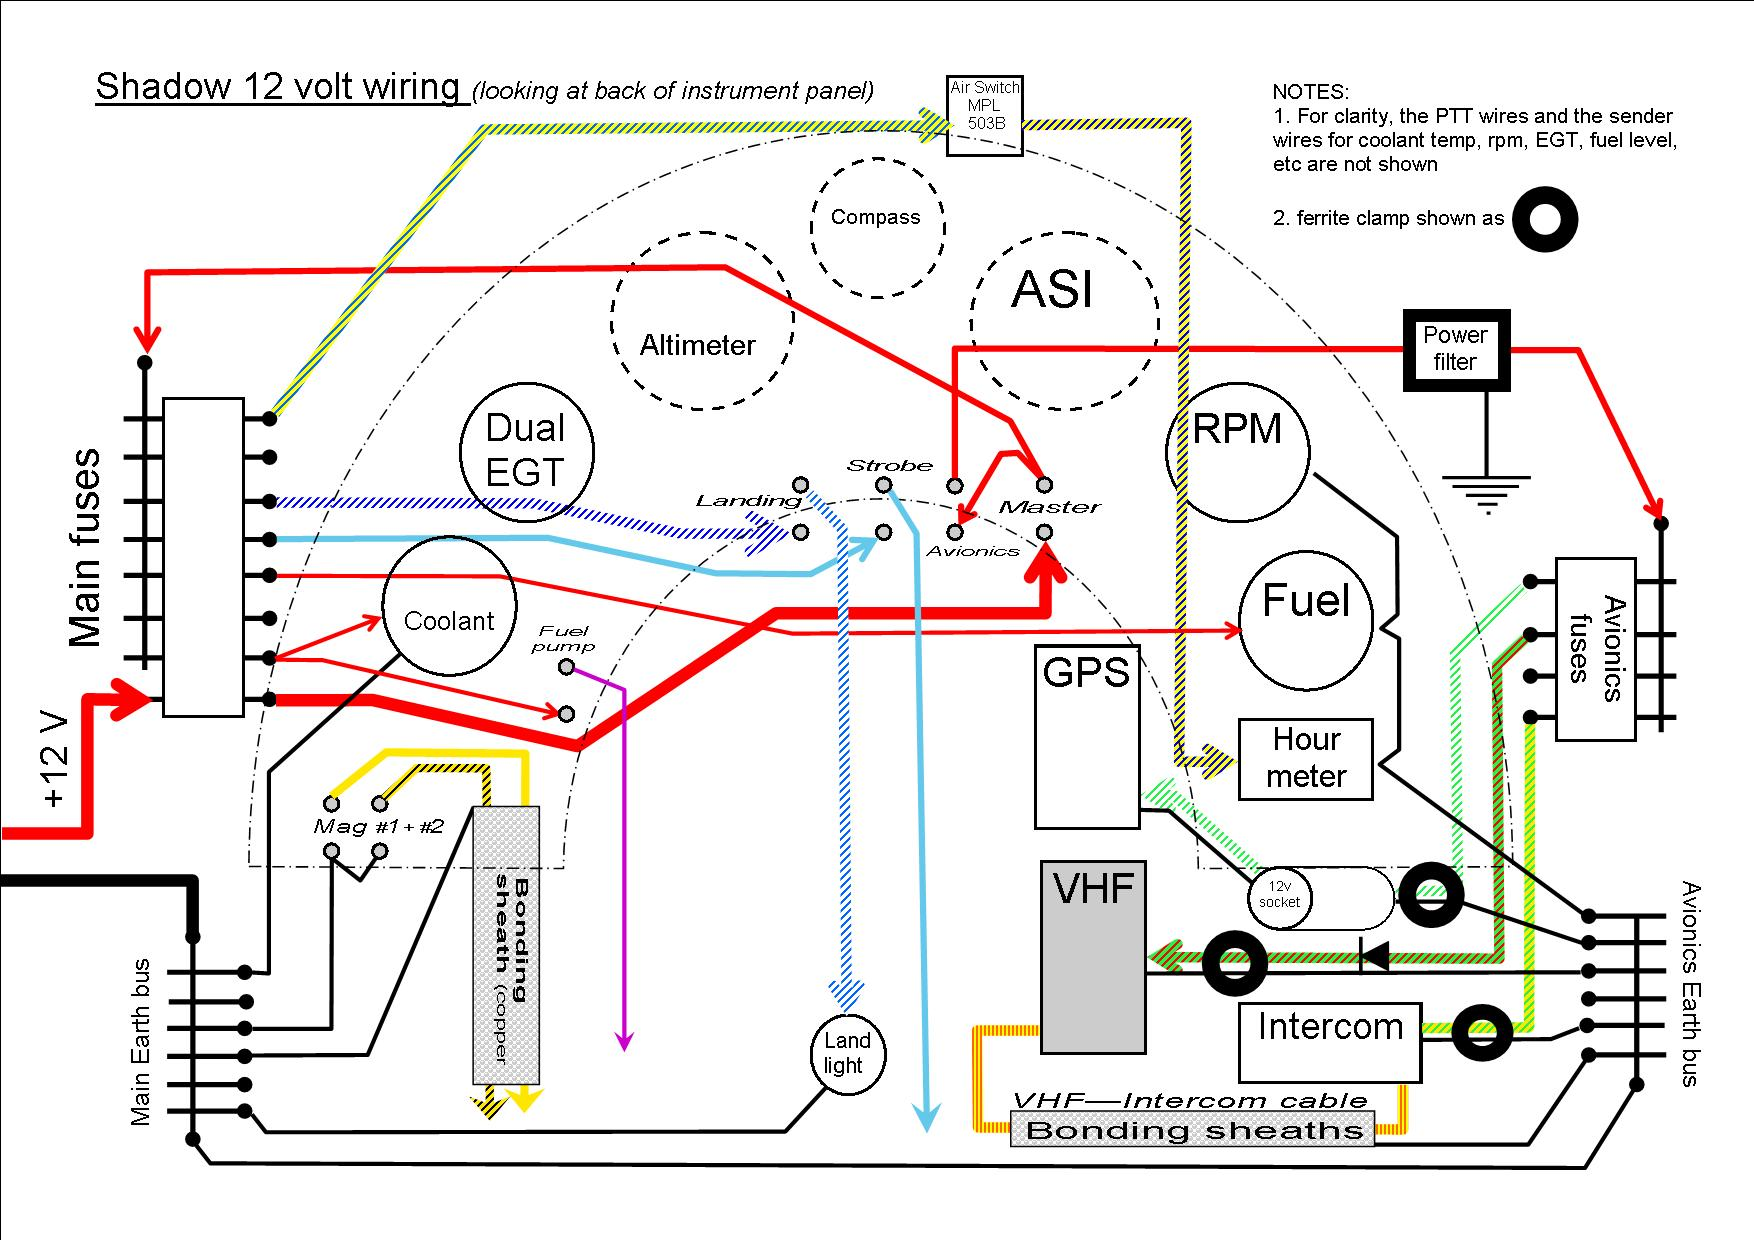 [QMVU_8575]  ER_7147] Rotax Ignition Points Wiring Diagram Free Download Schematic Wiring | Rotax 912 Ignition Wiring Diagram |  | Ophag Numap Mohammedshrine Librar Wiring 101